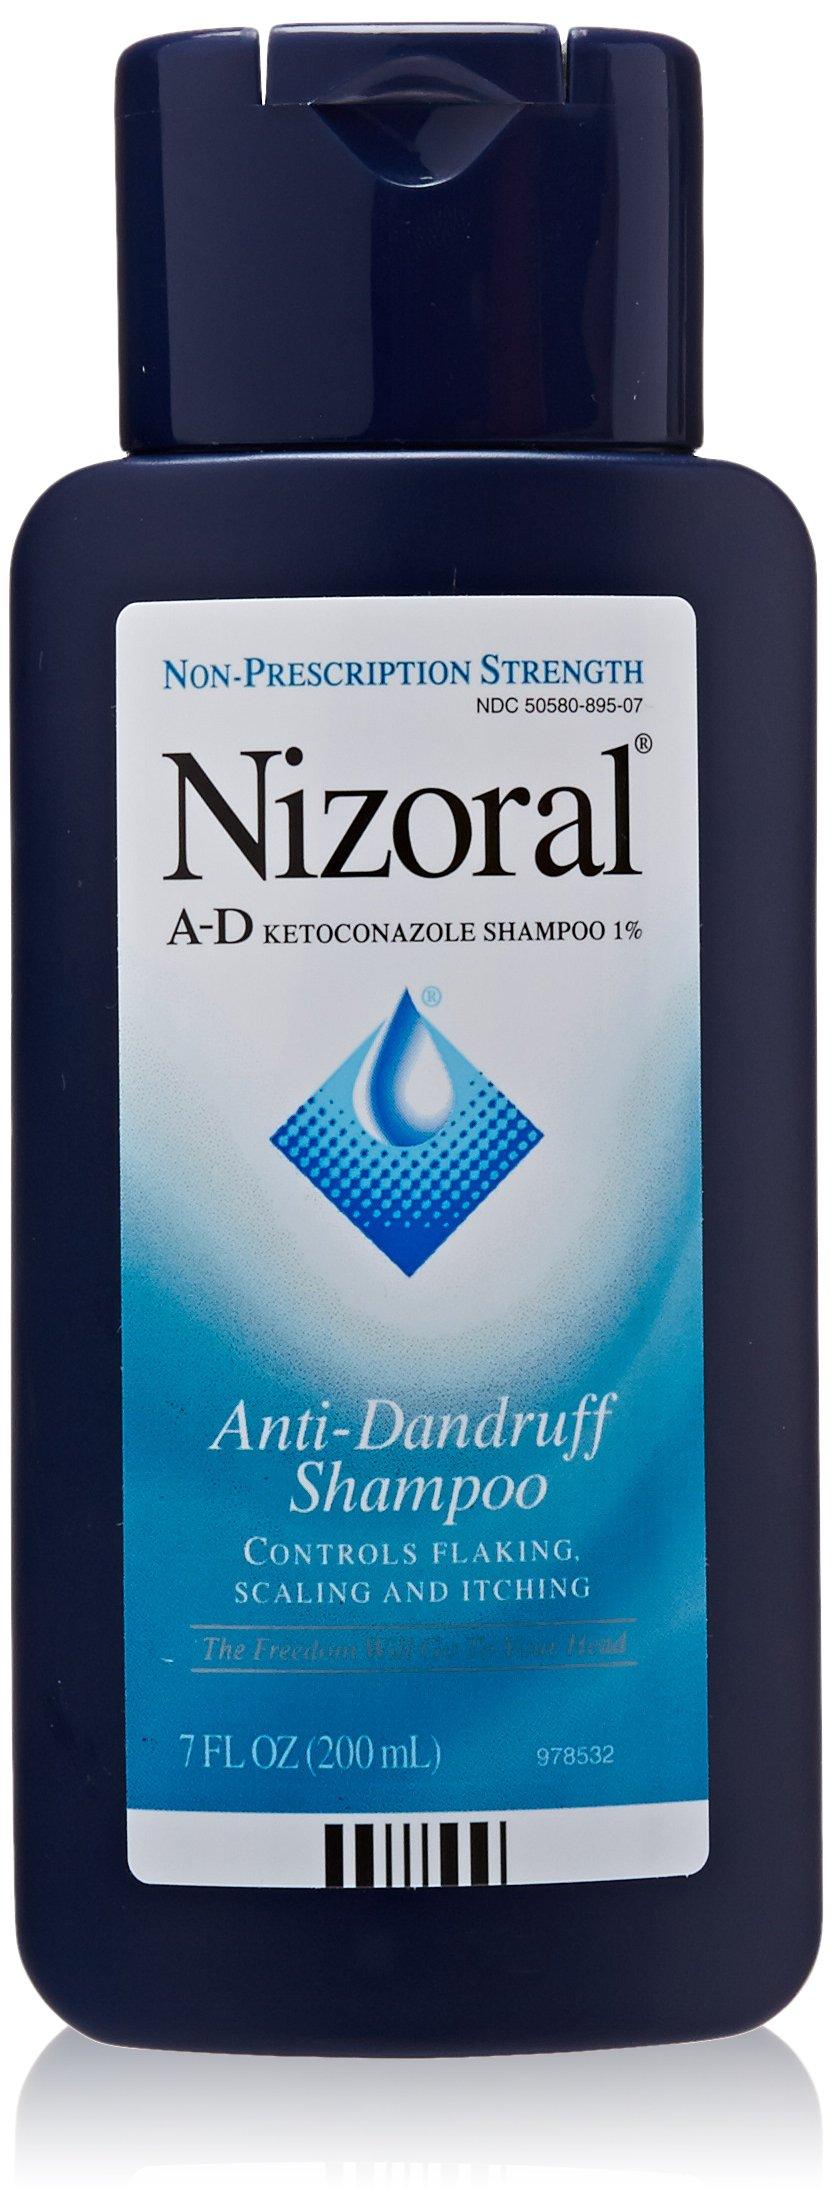 Nizoral A, D Anti, Dandruff Shampoo, 7 oz (Quantity of 2)